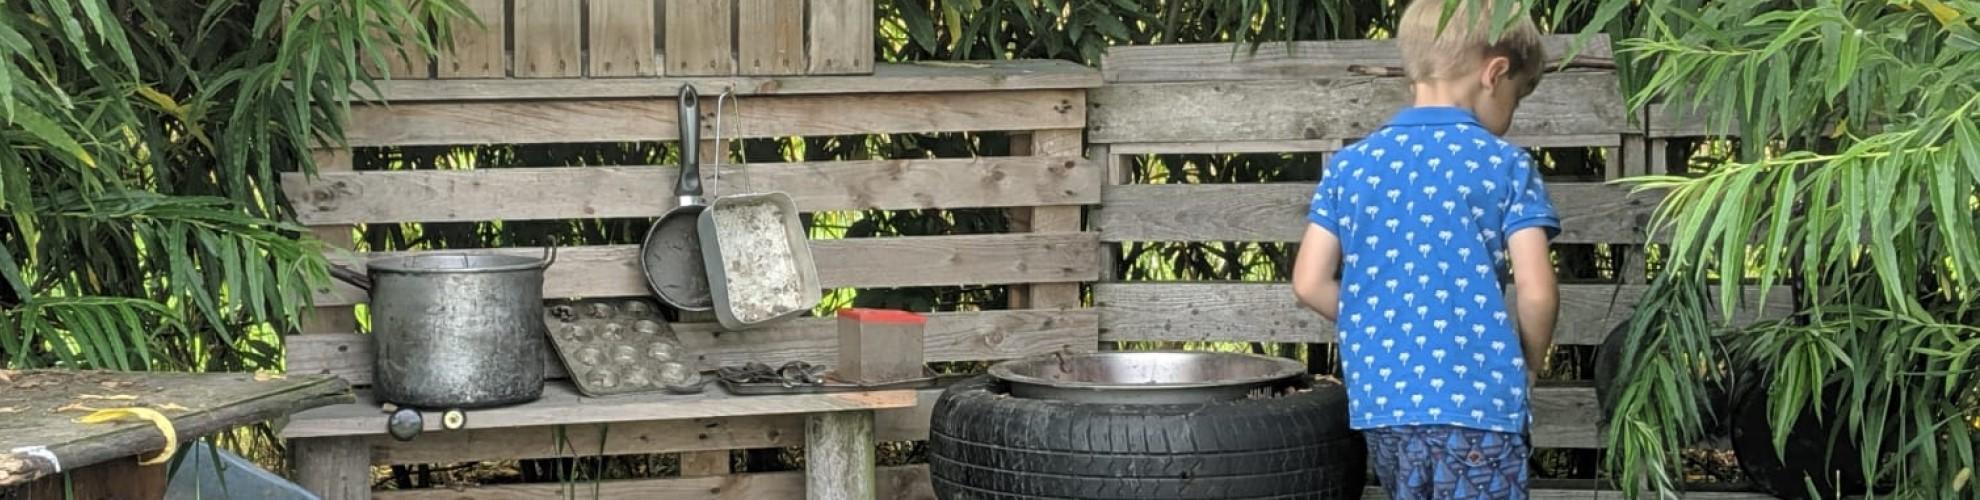 DERBY FOREST SCHOOL background image